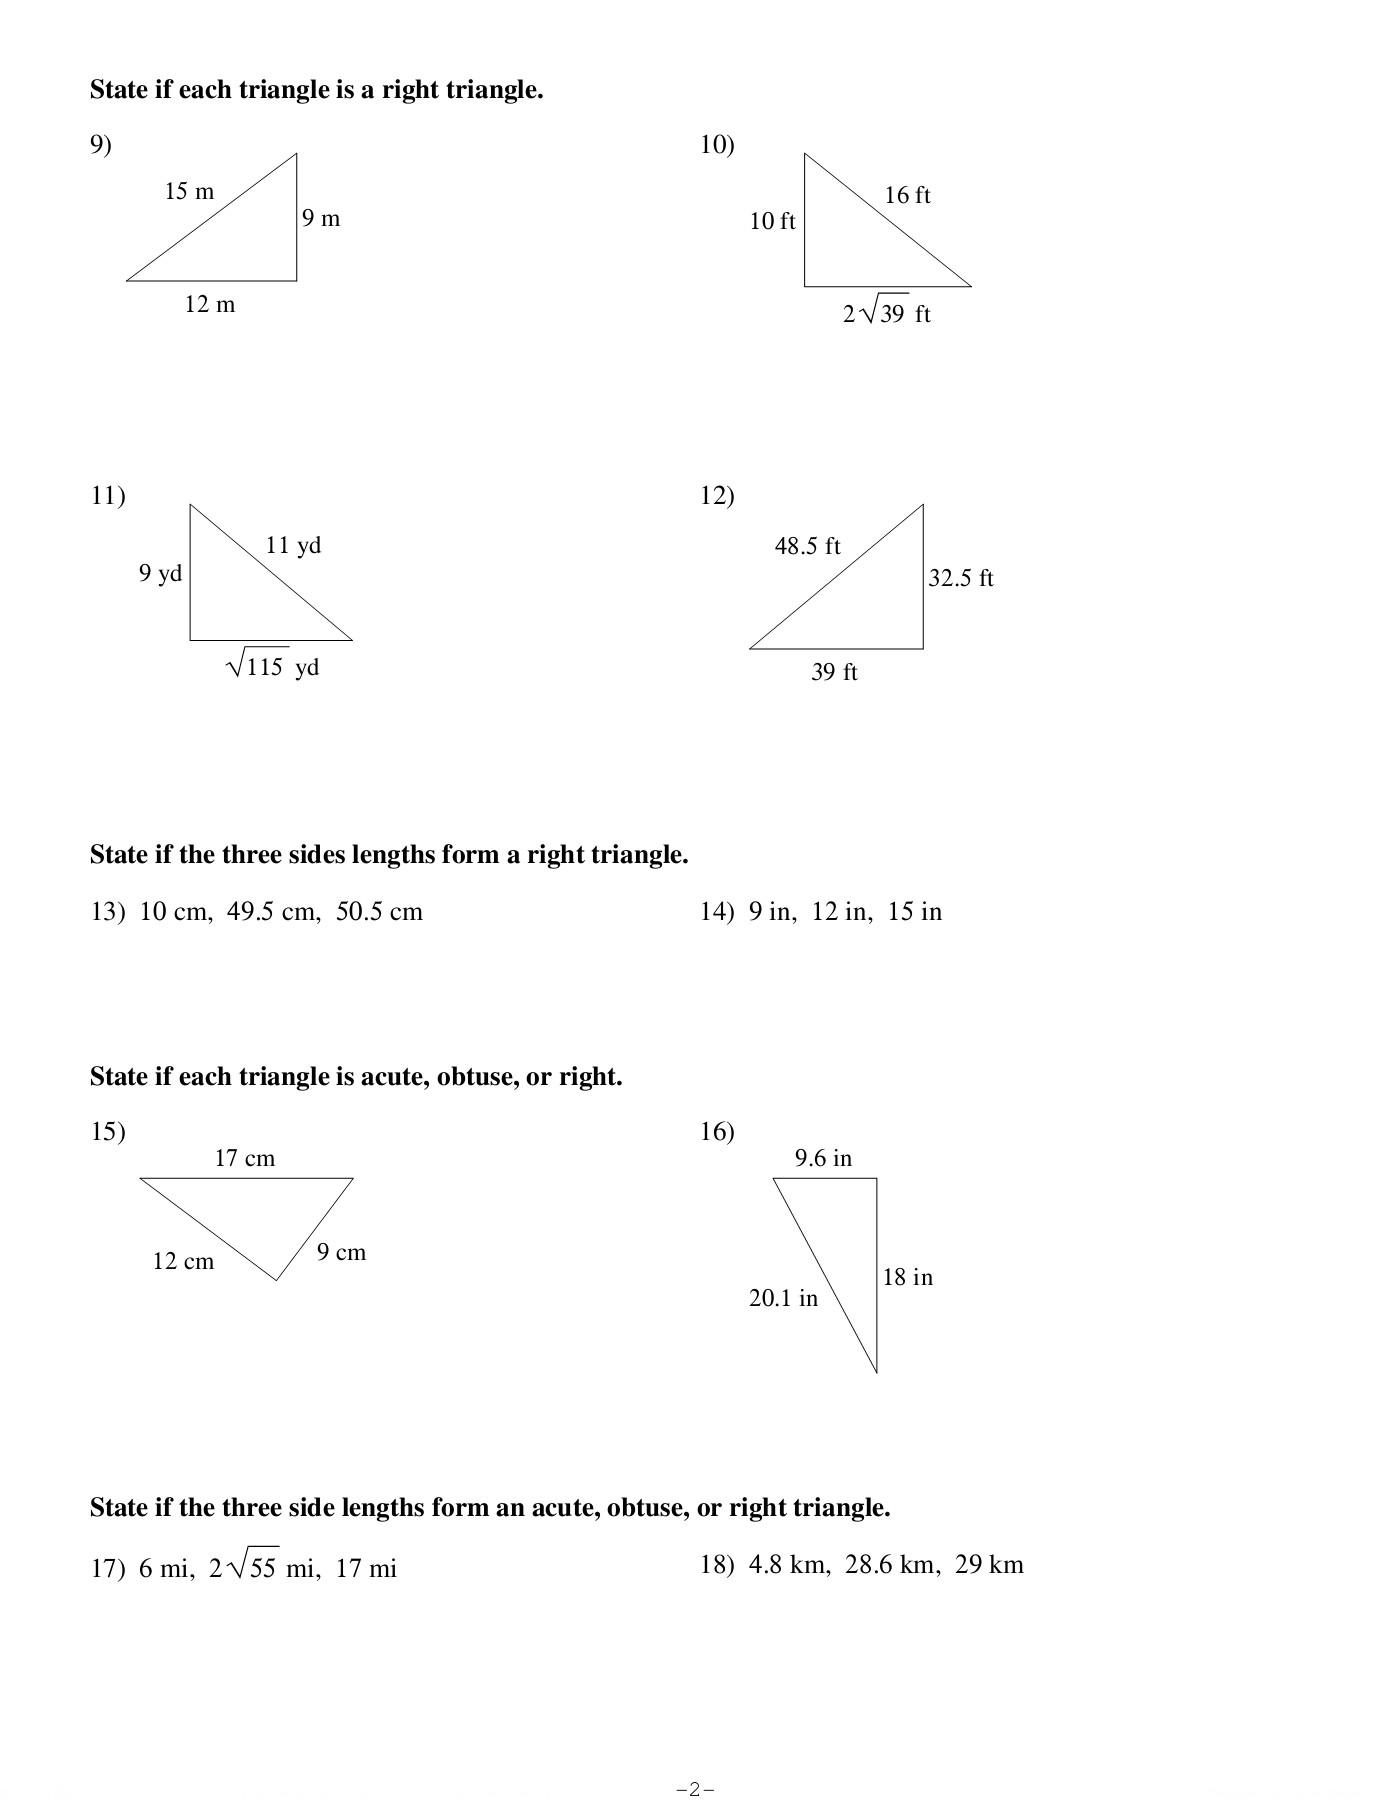 فوضوي الصبر فارغة the pythagorean theorem and its converse answers -  pleasantgroveumc.net [ 1800 x 1391 Pixel ]